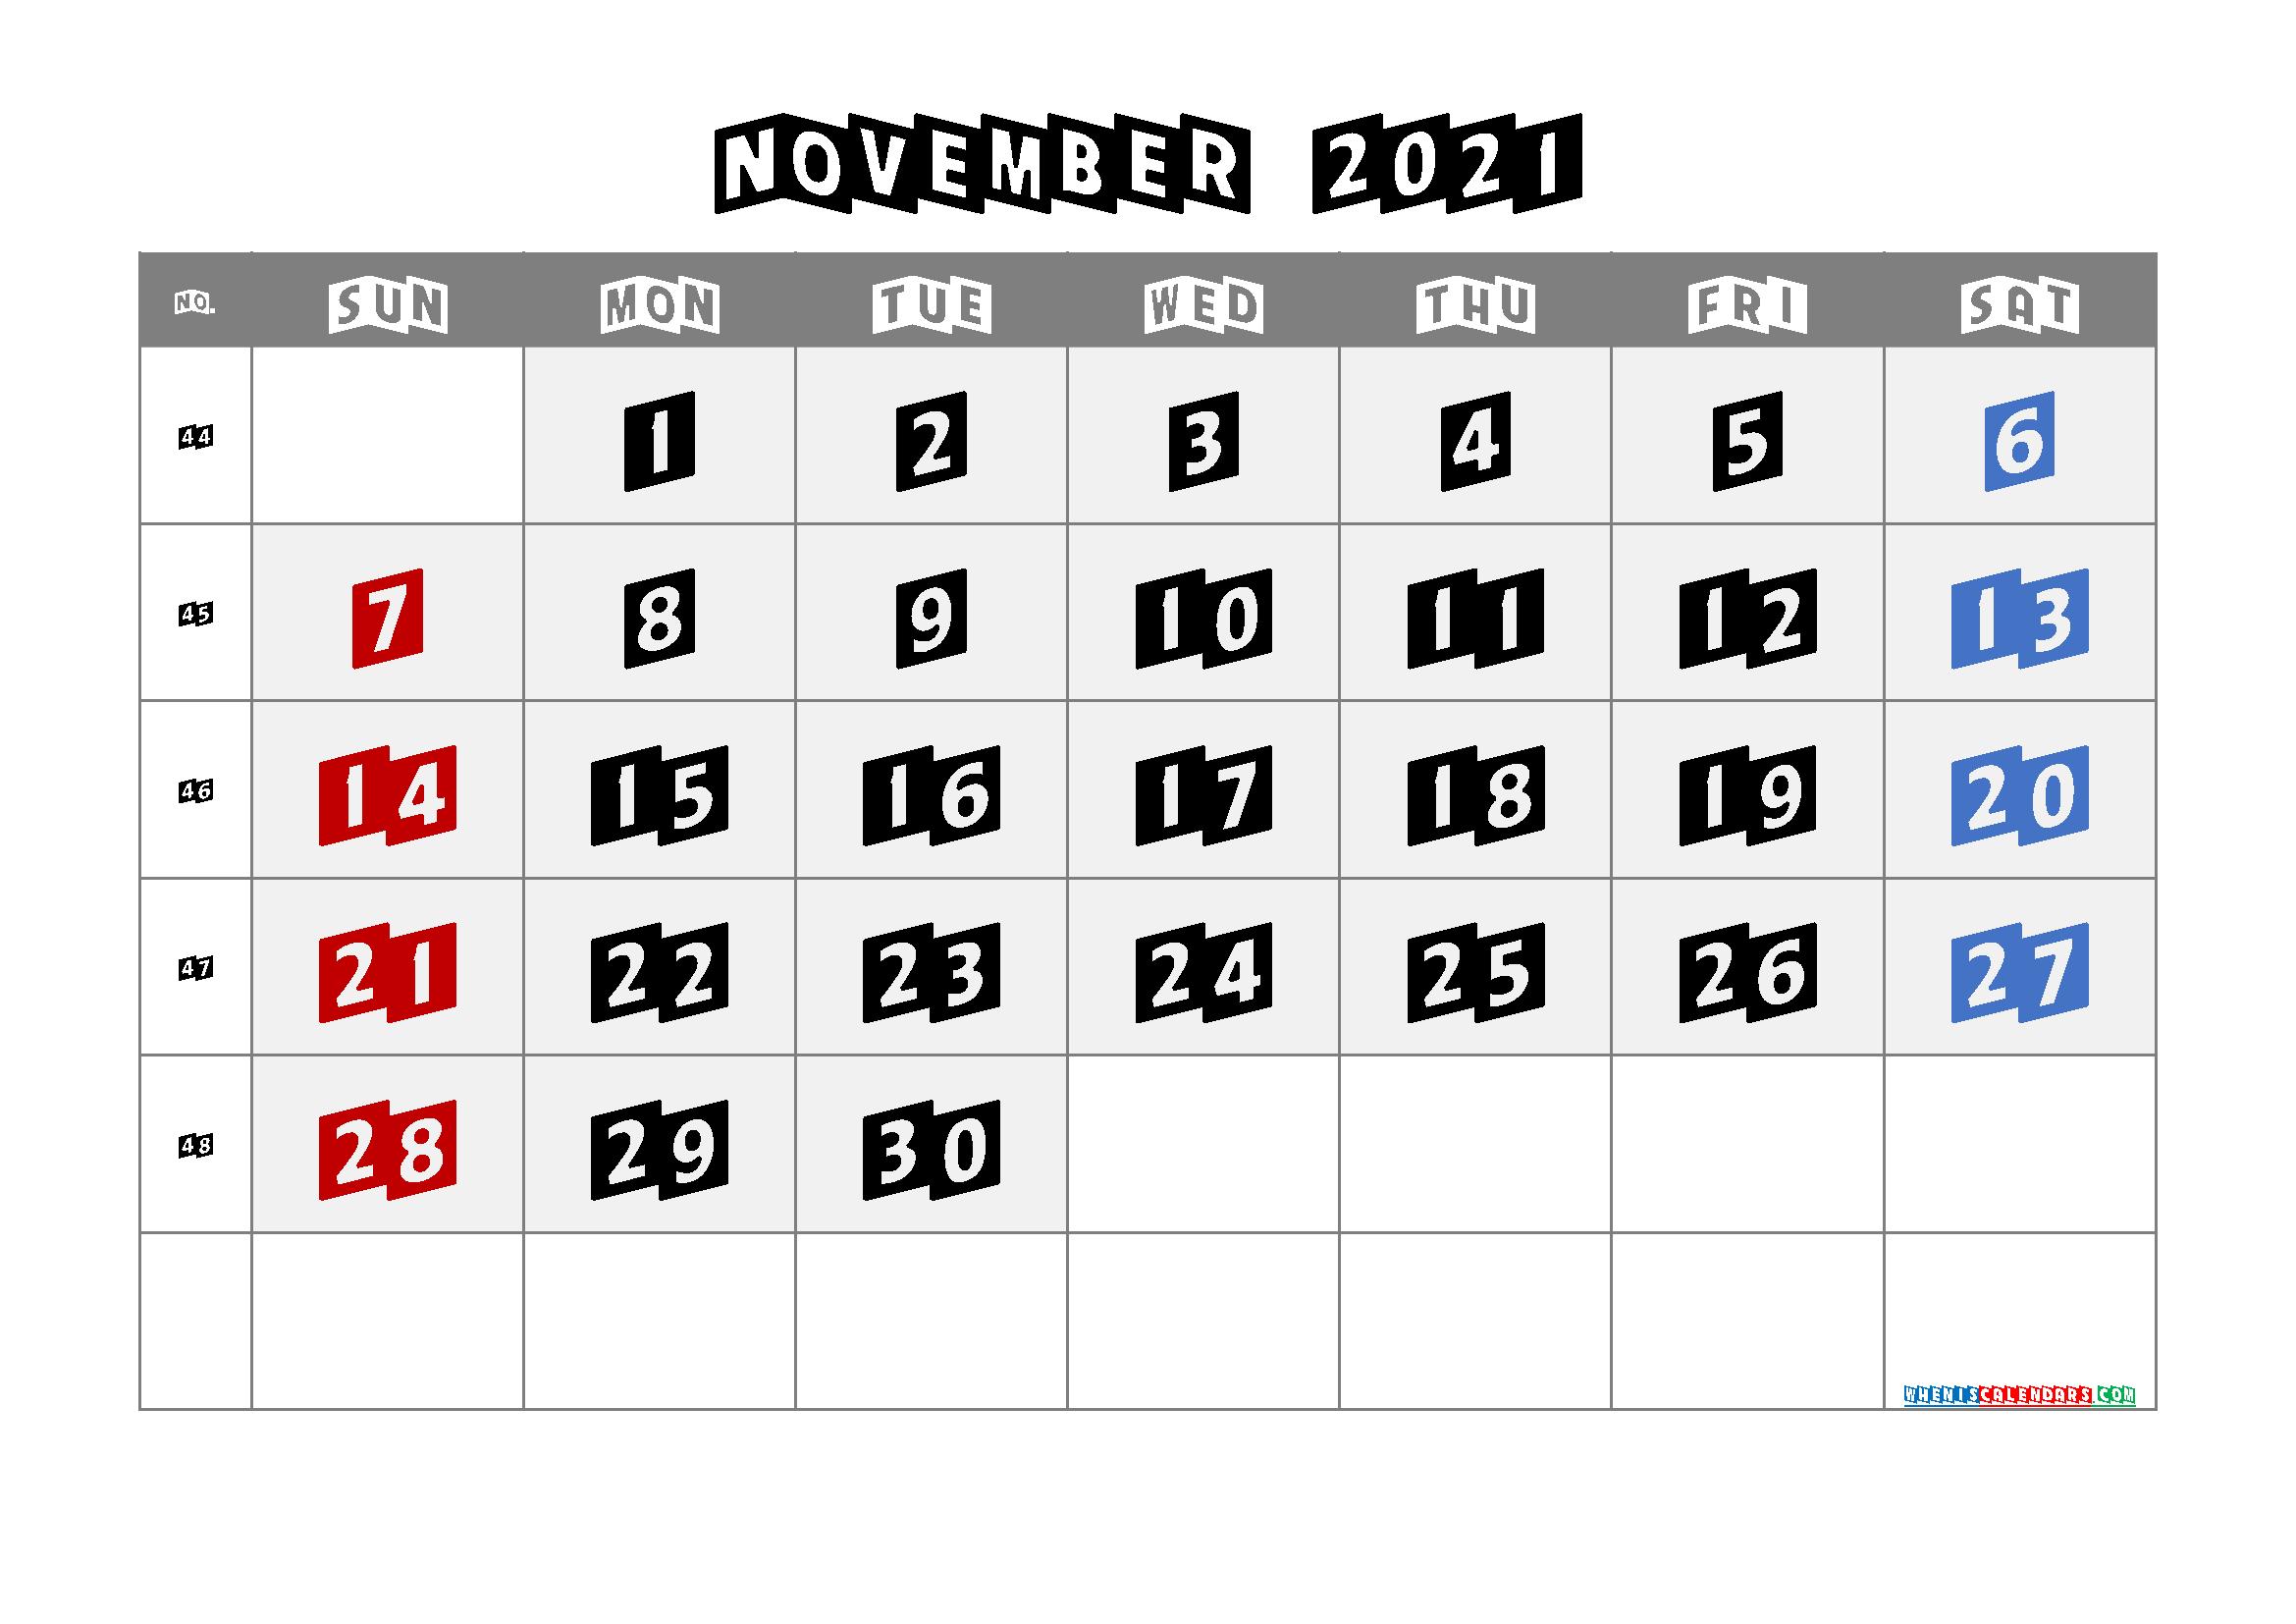 Free Printable Calendar November 2021 2022 and 2023